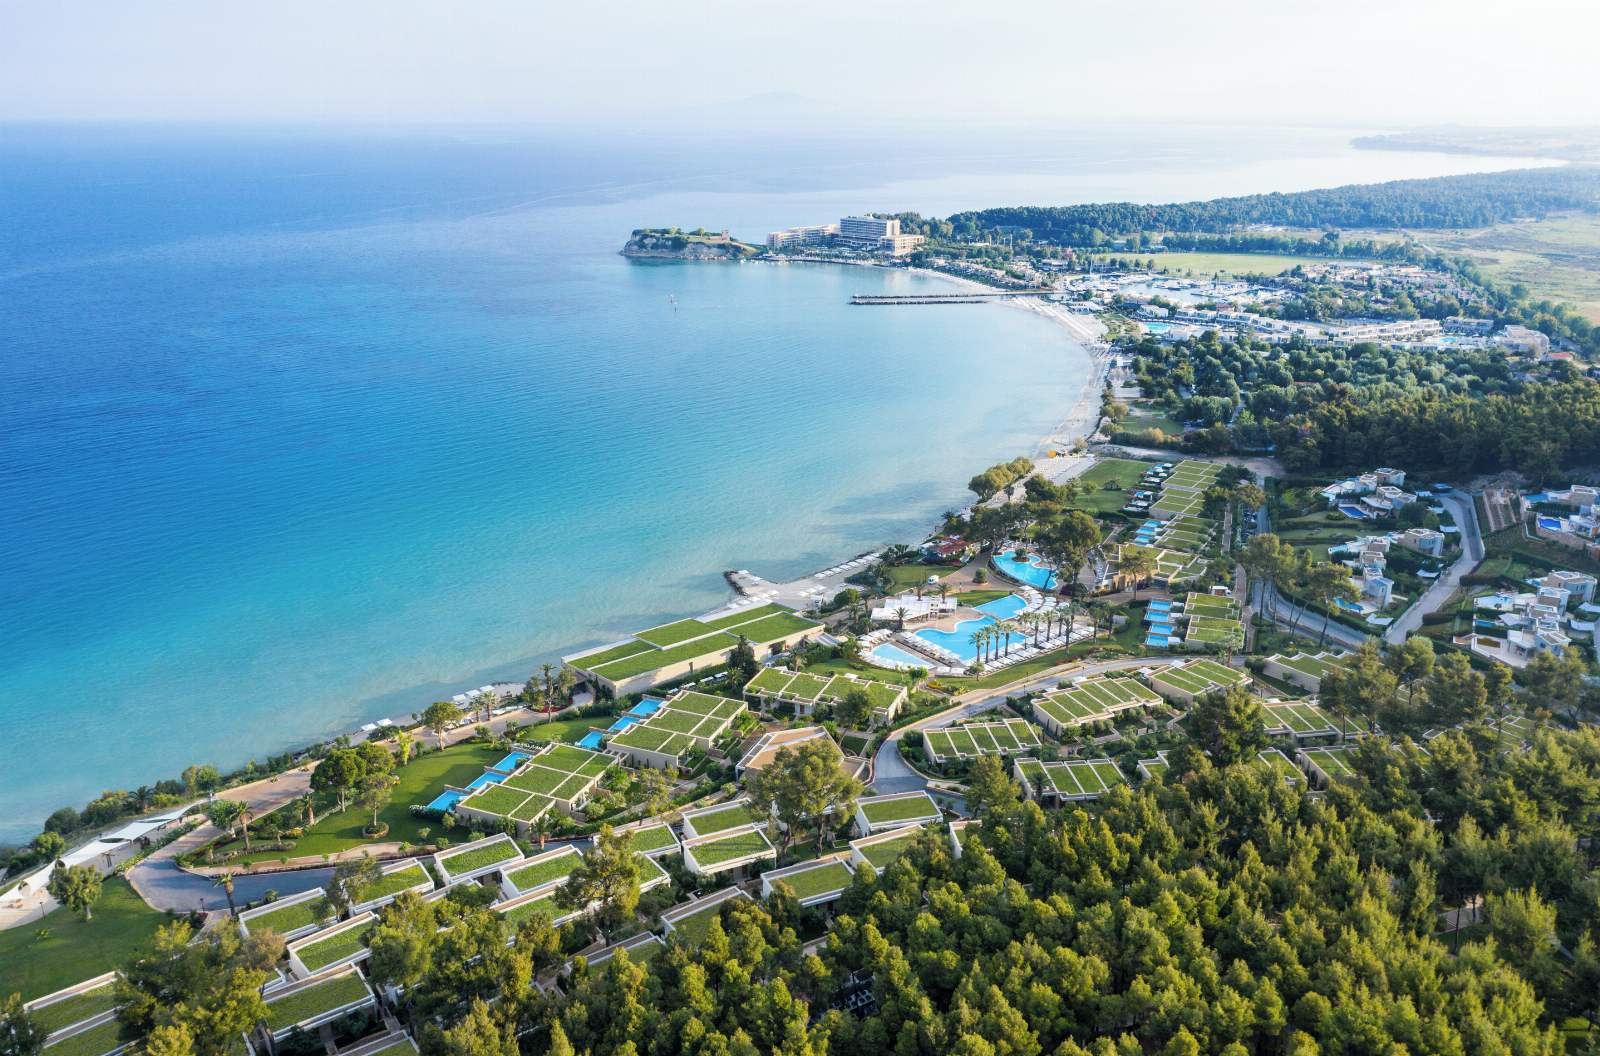 Sani Resort - Sani Club